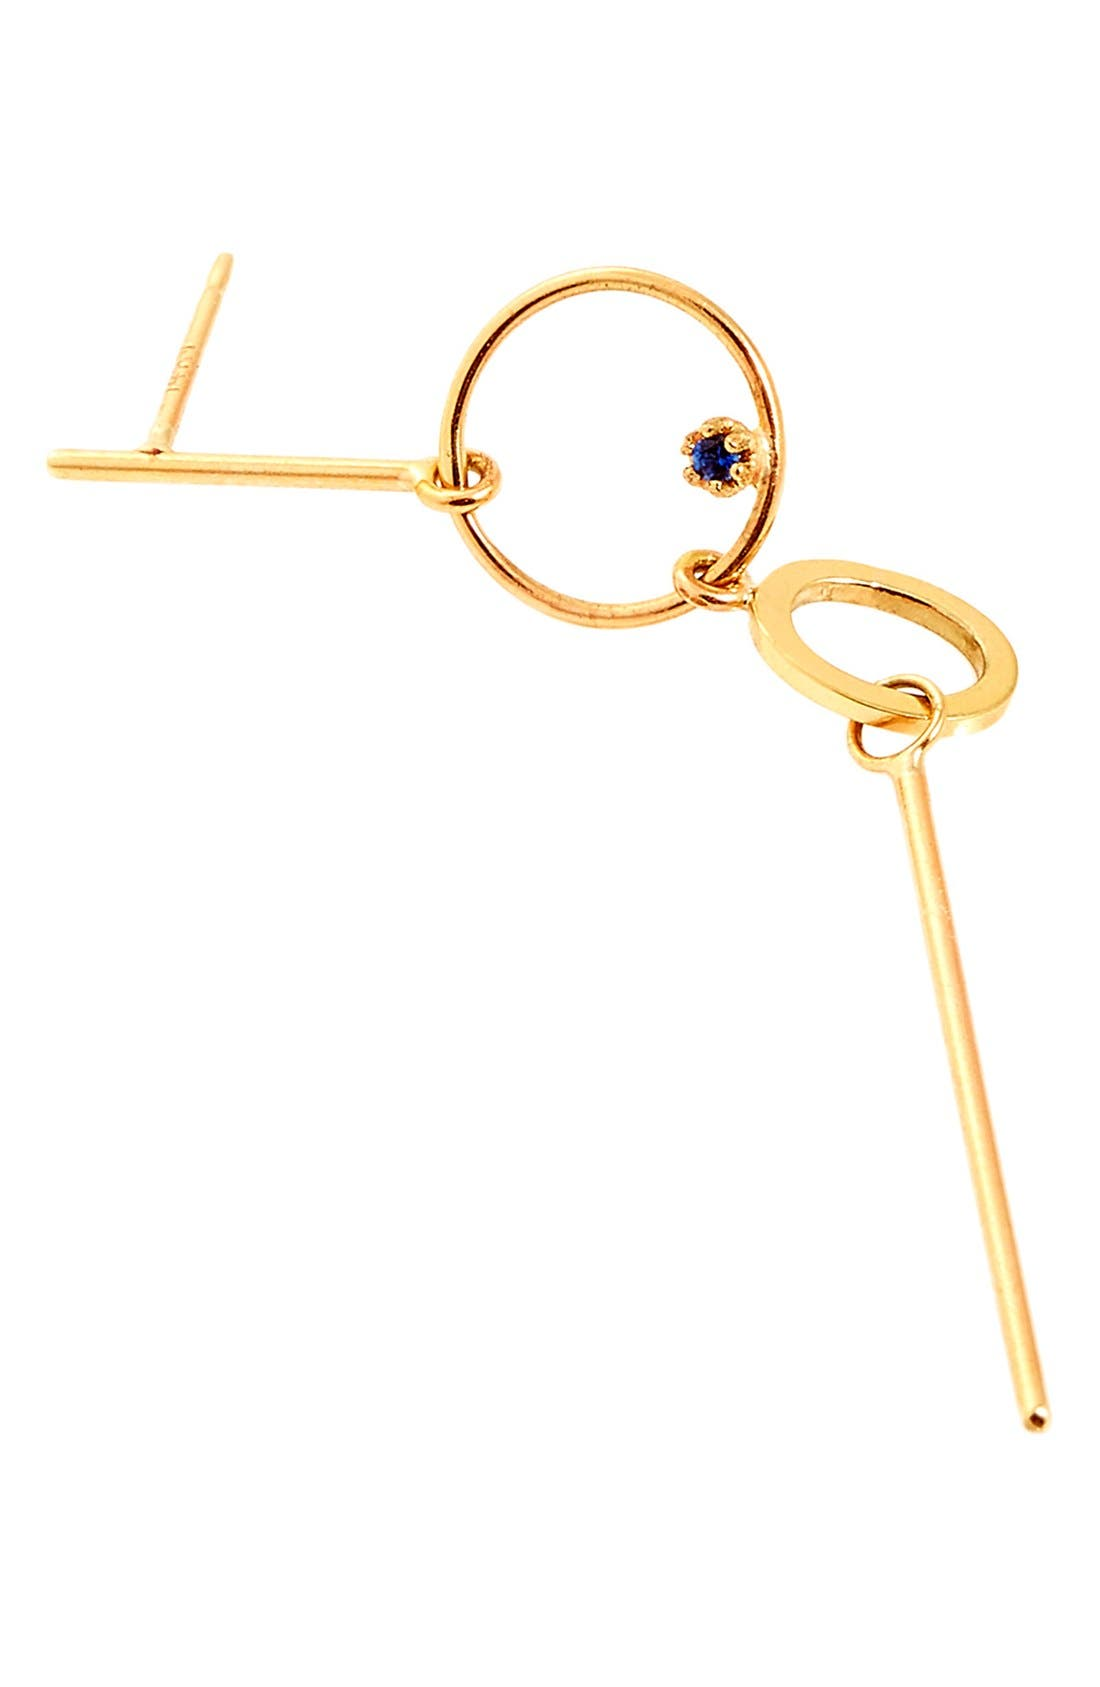 'Long Bubble' Gold & Sapphire Statement Earring,                             Main thumbnail 1, color,                             710